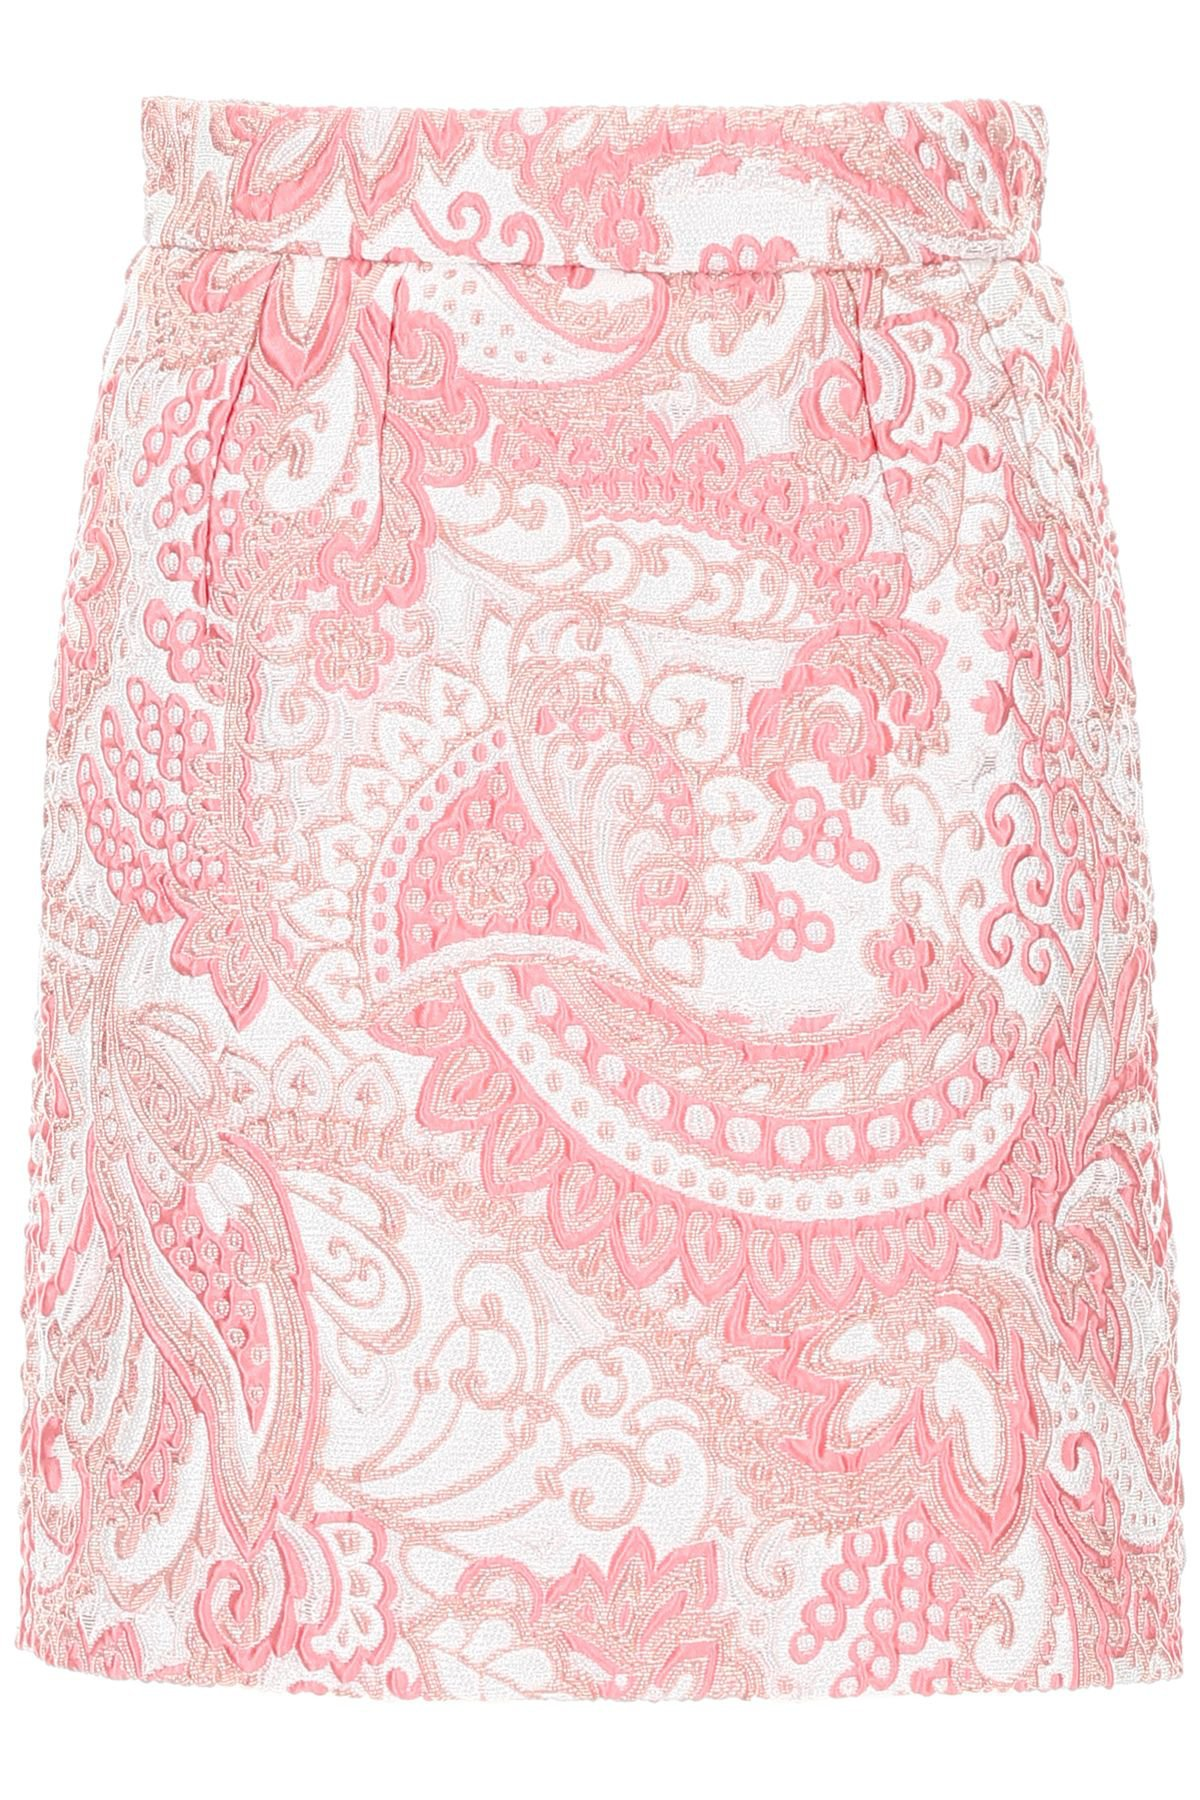 Dolce & Gabbana Jacquard Mini Skirt